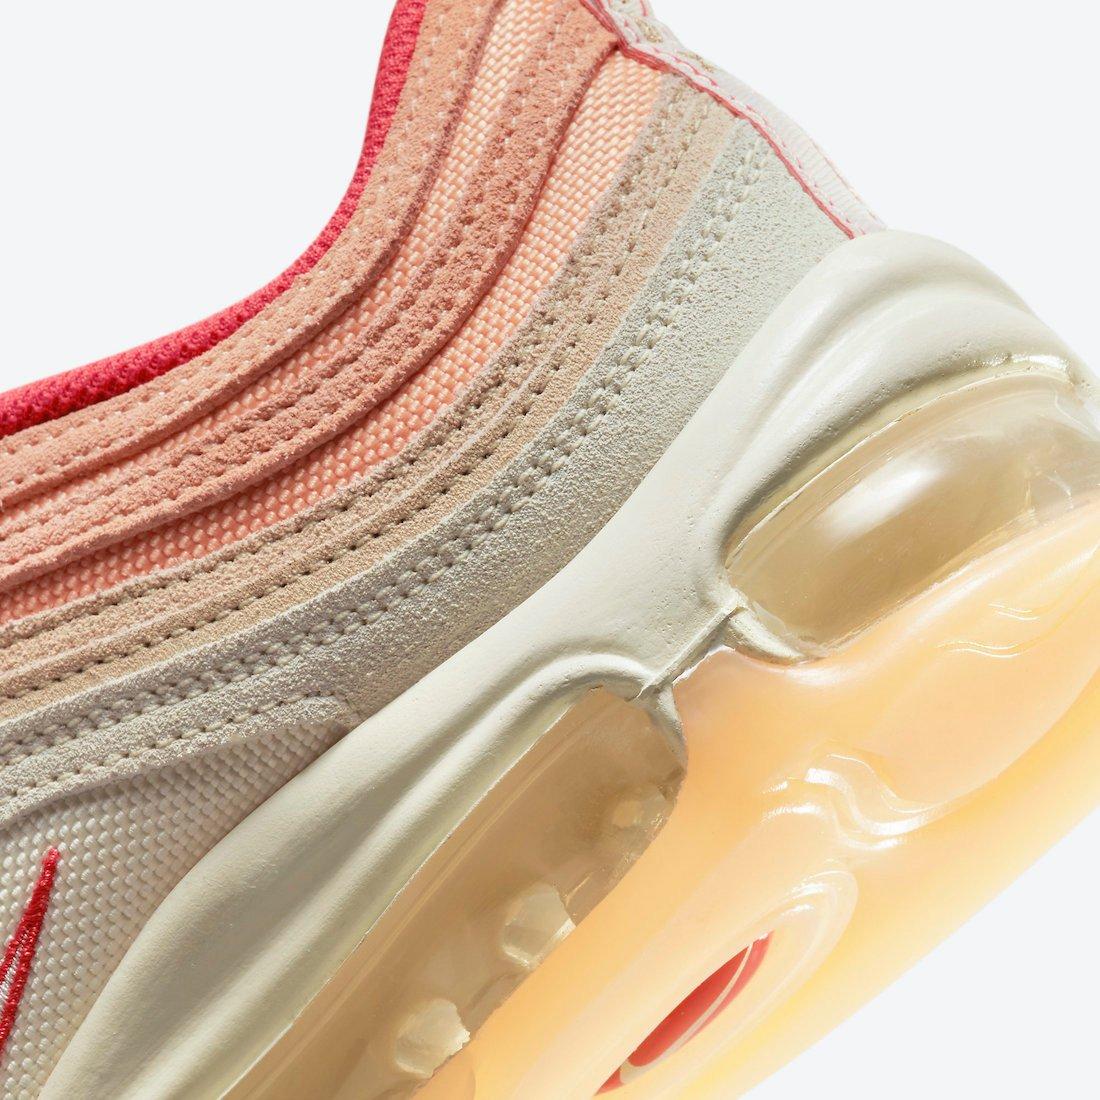 Nike Air Max 97 Sisterhood DM8943-700 Release Date Info